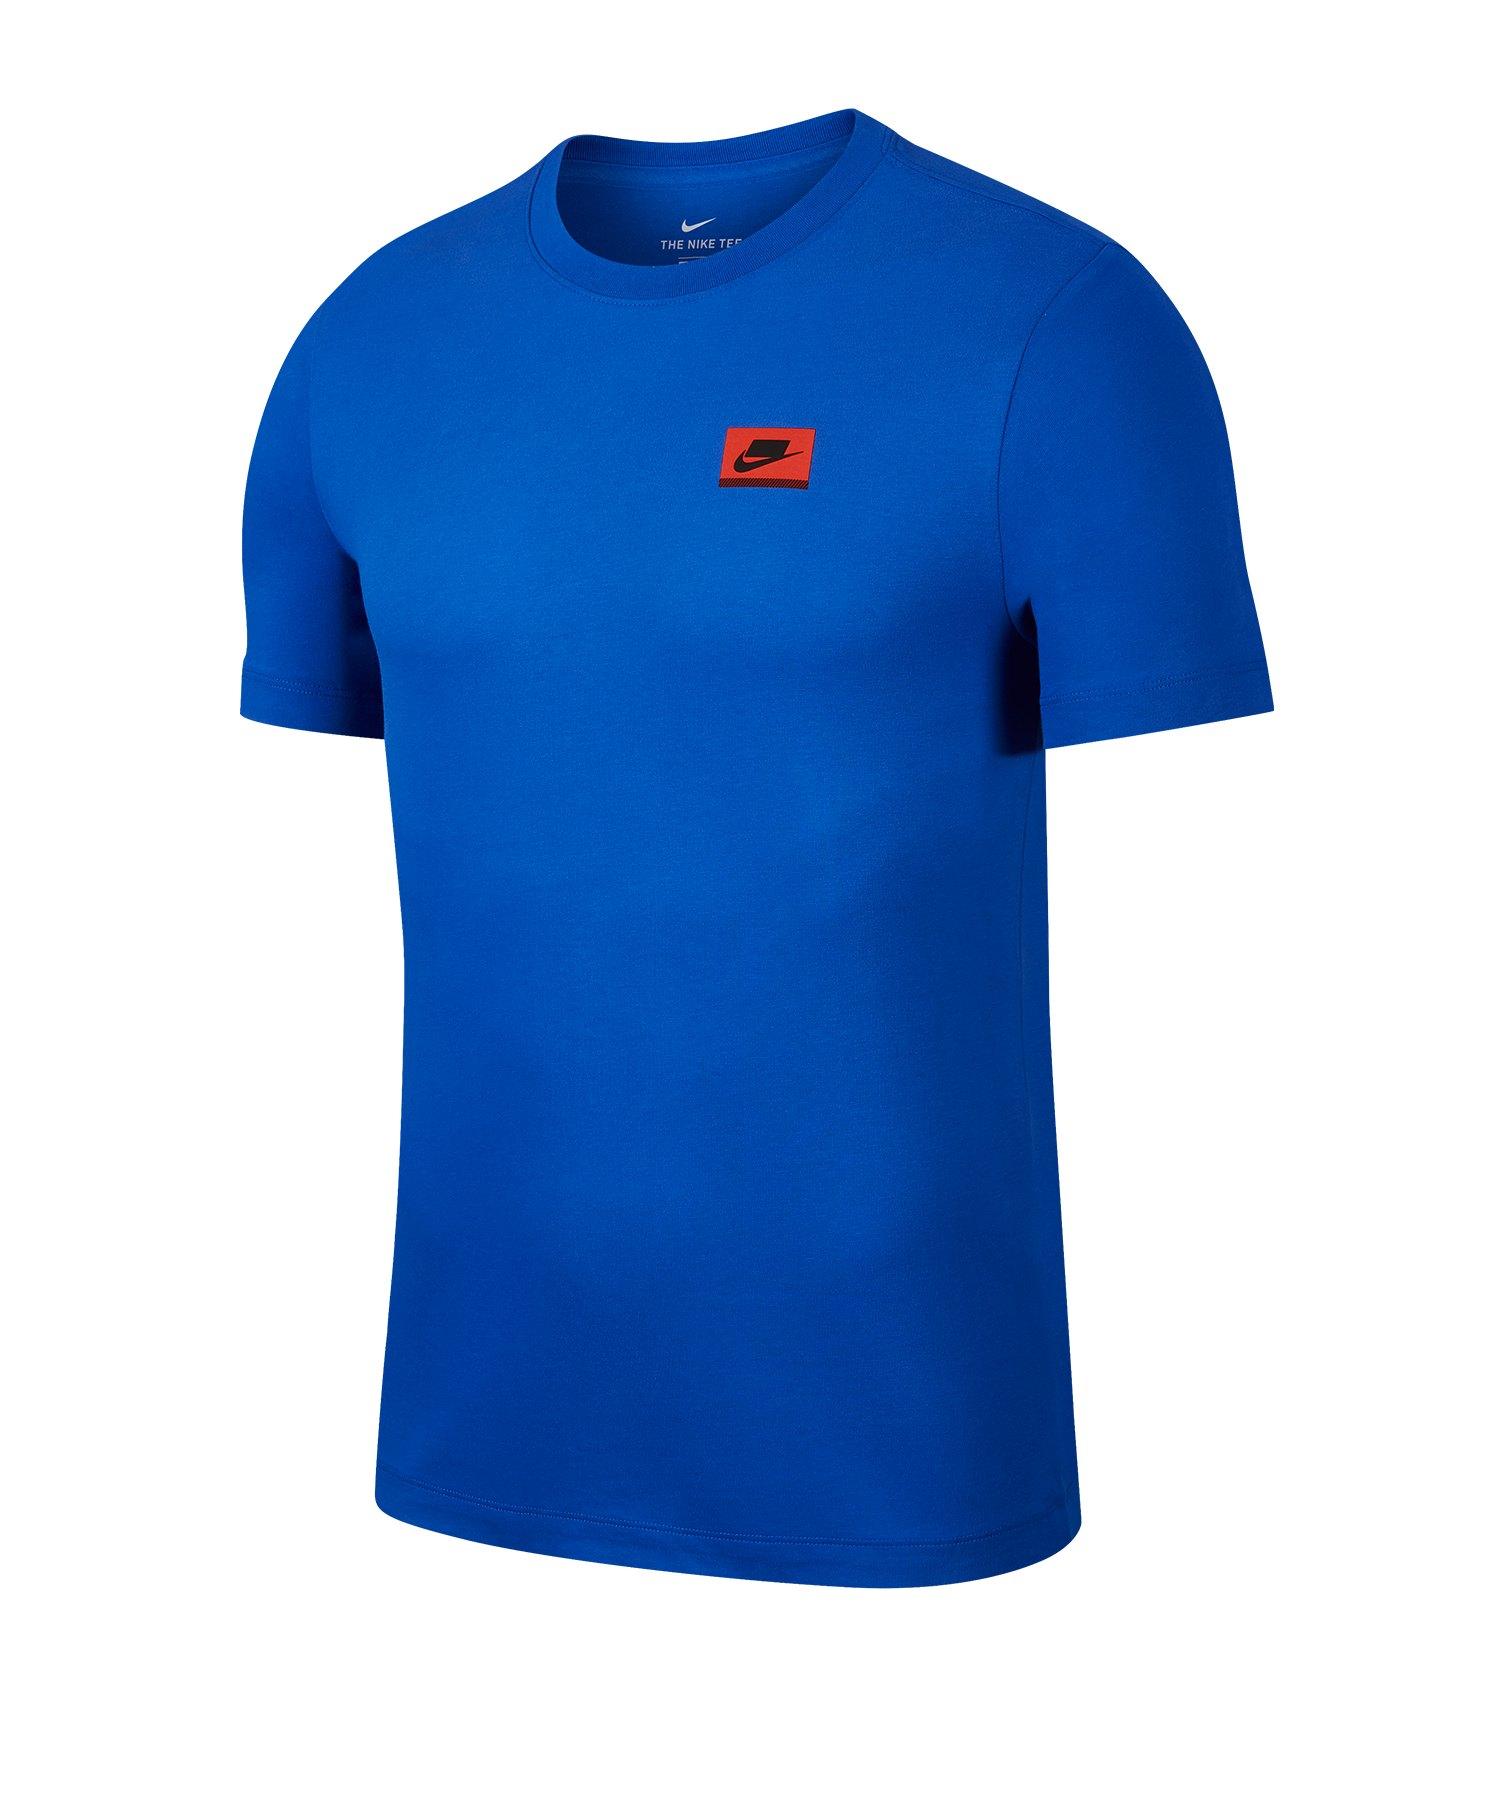 Nike Dri-FIT Tee T-Shirt Running Blau F480 - blau